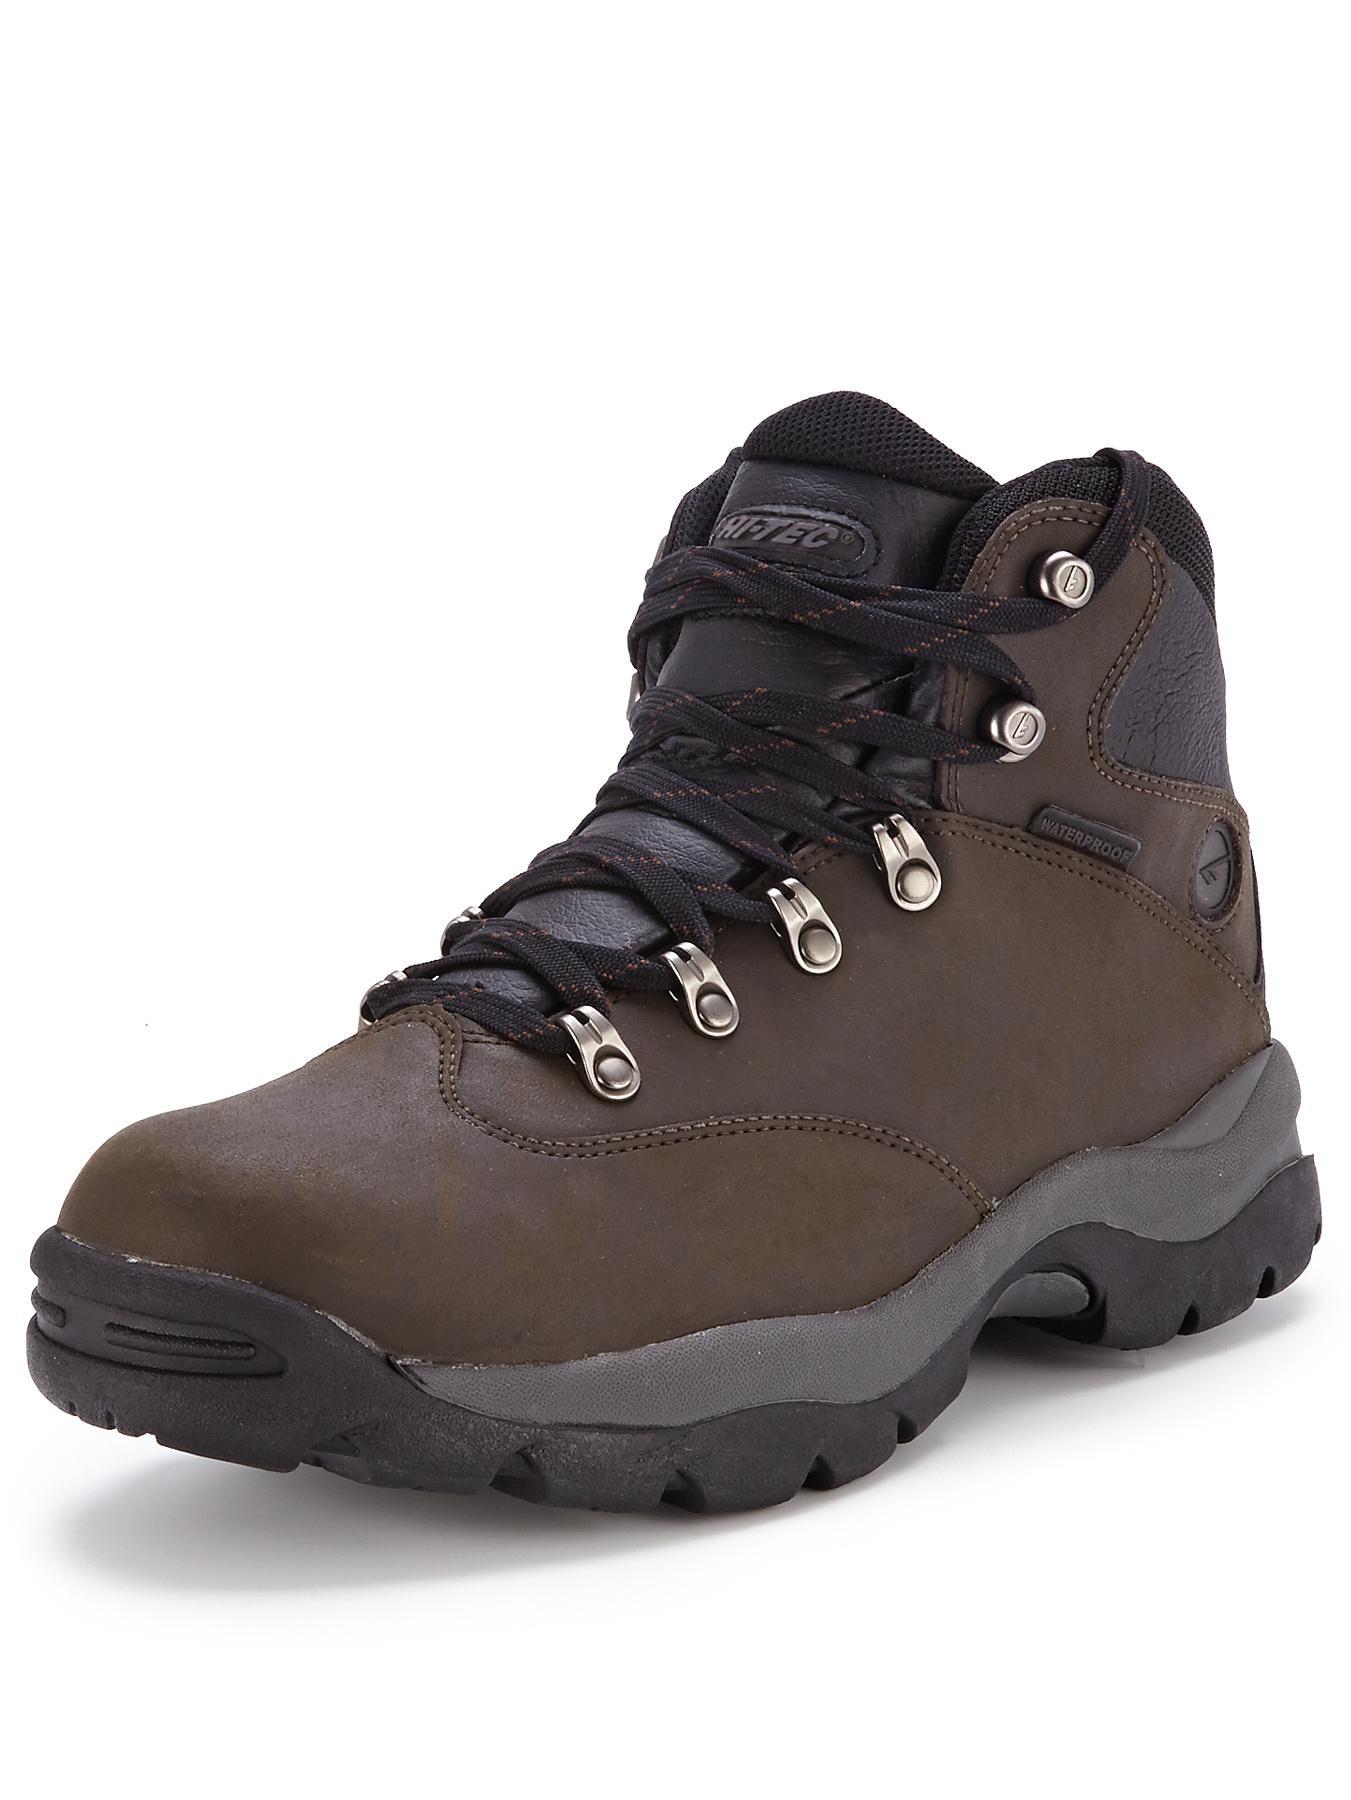 ottawa wp mens boots chocolate